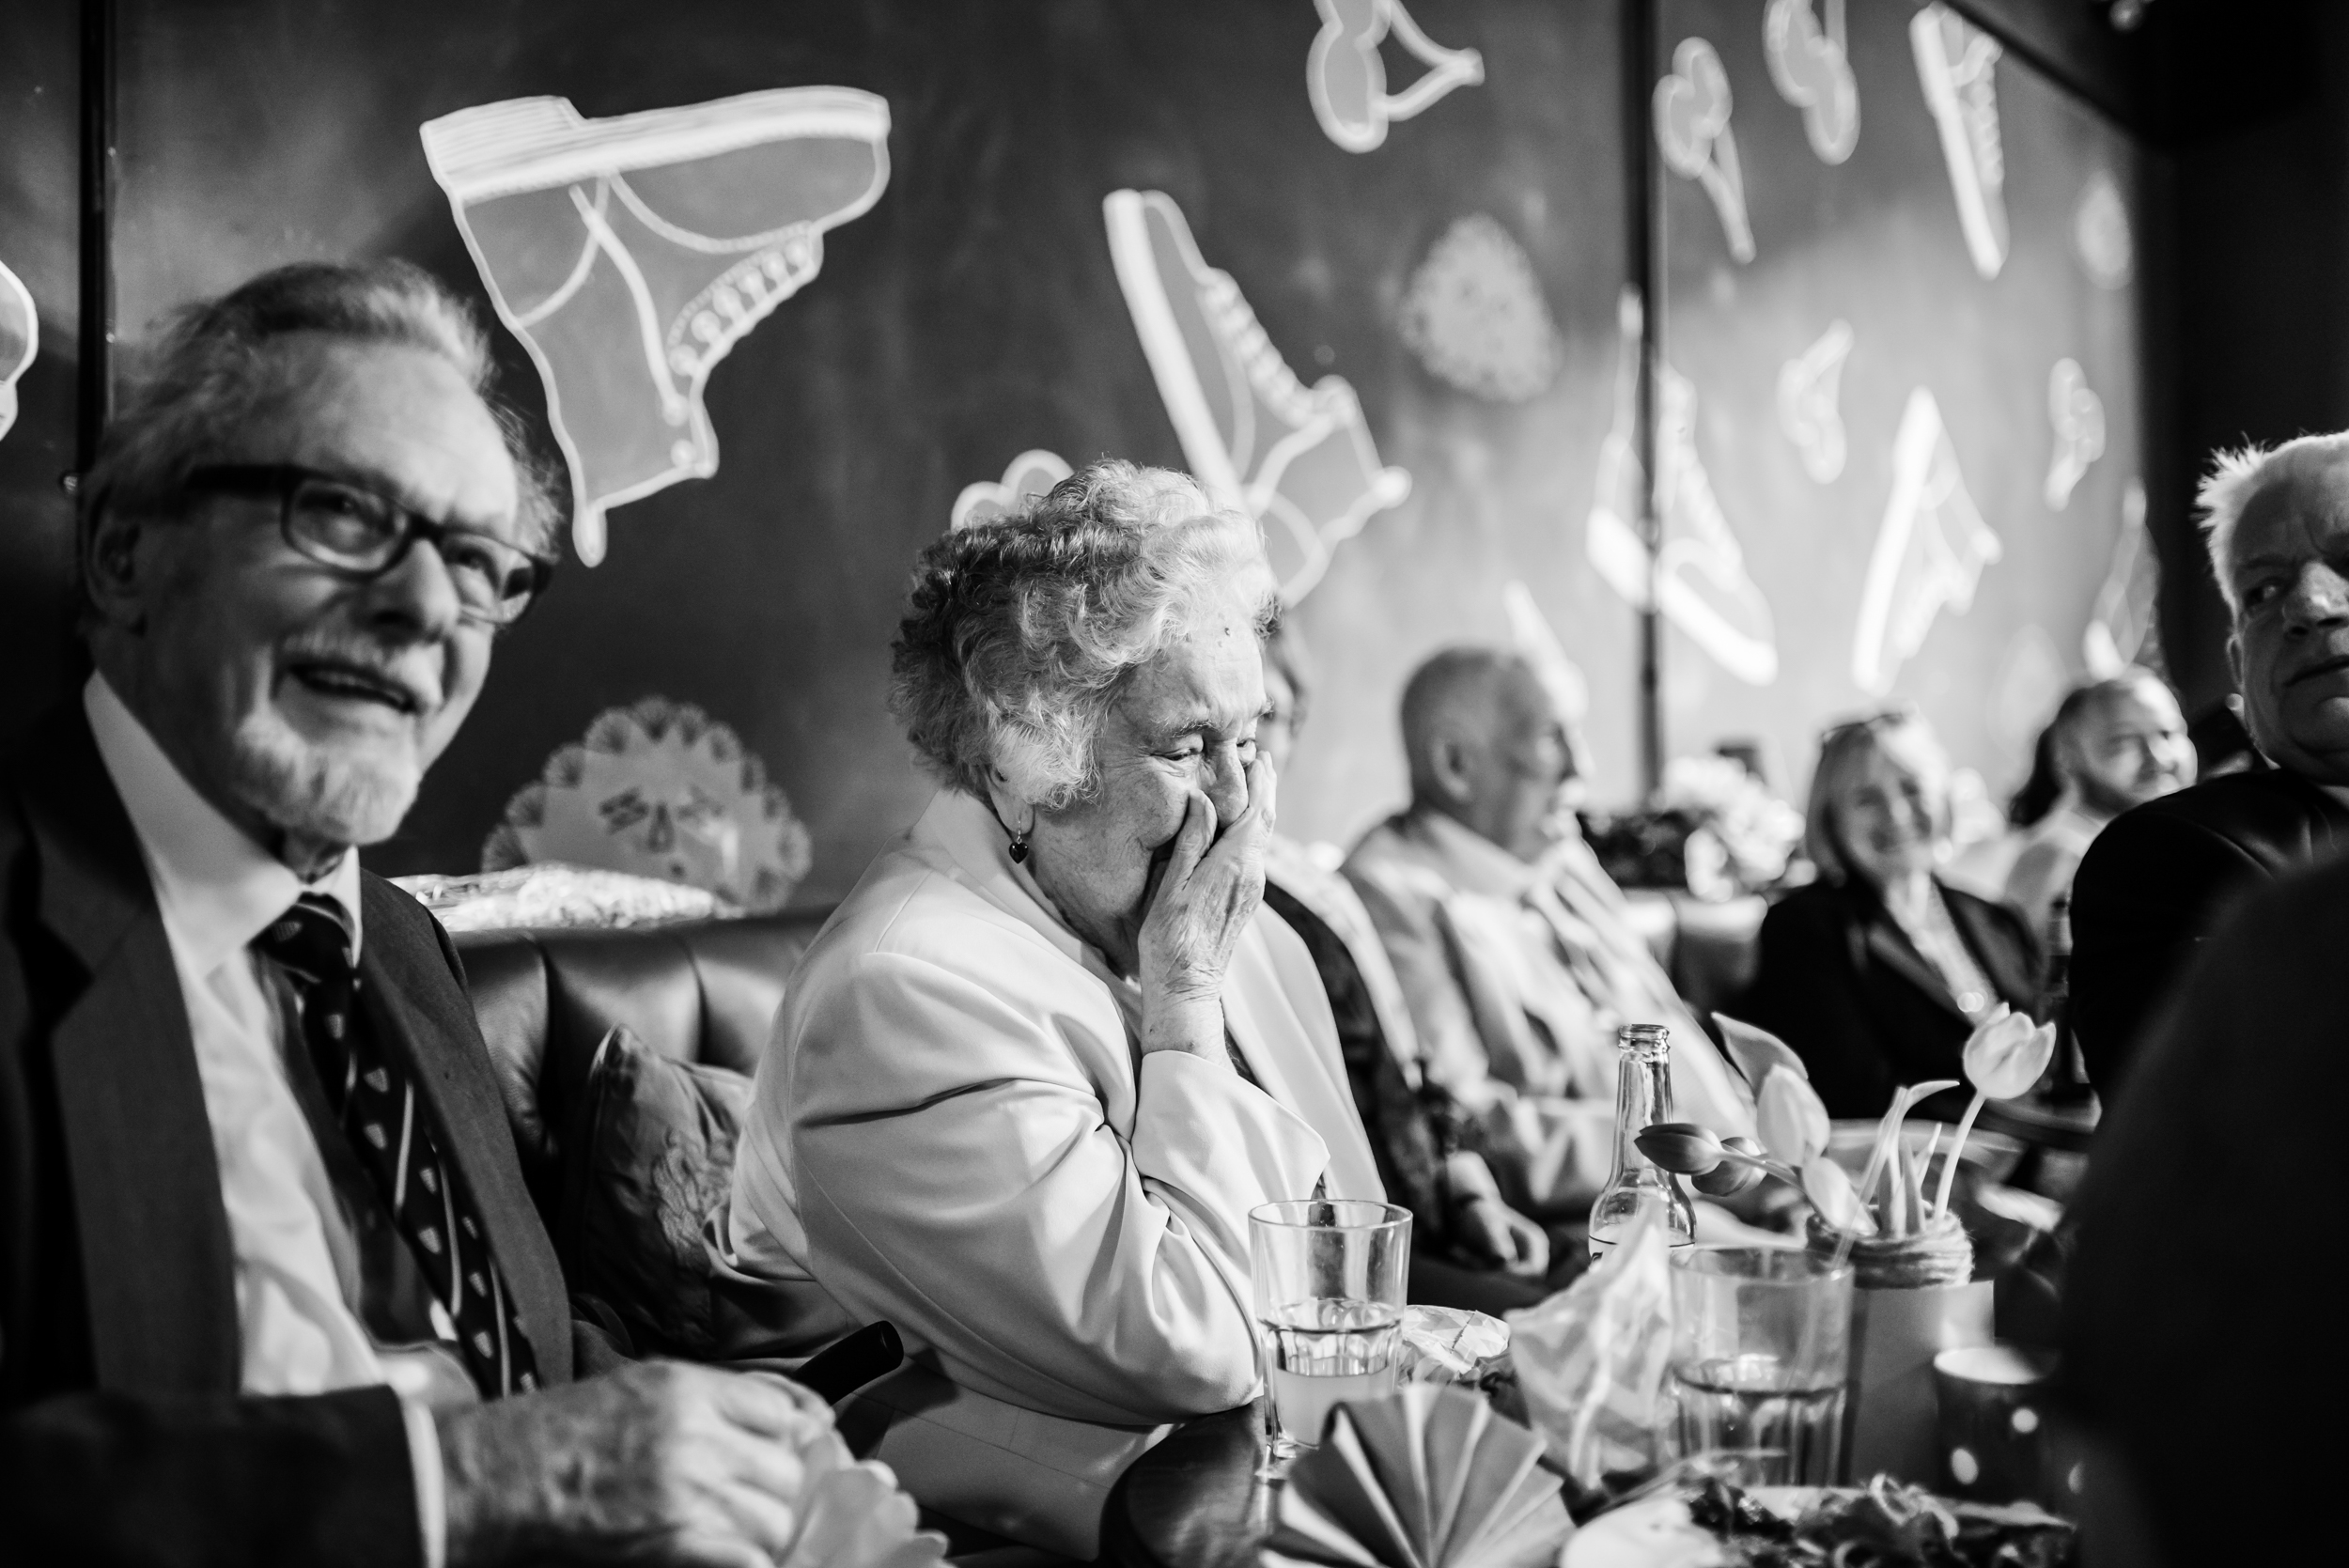 Grandma laughs at the wedding